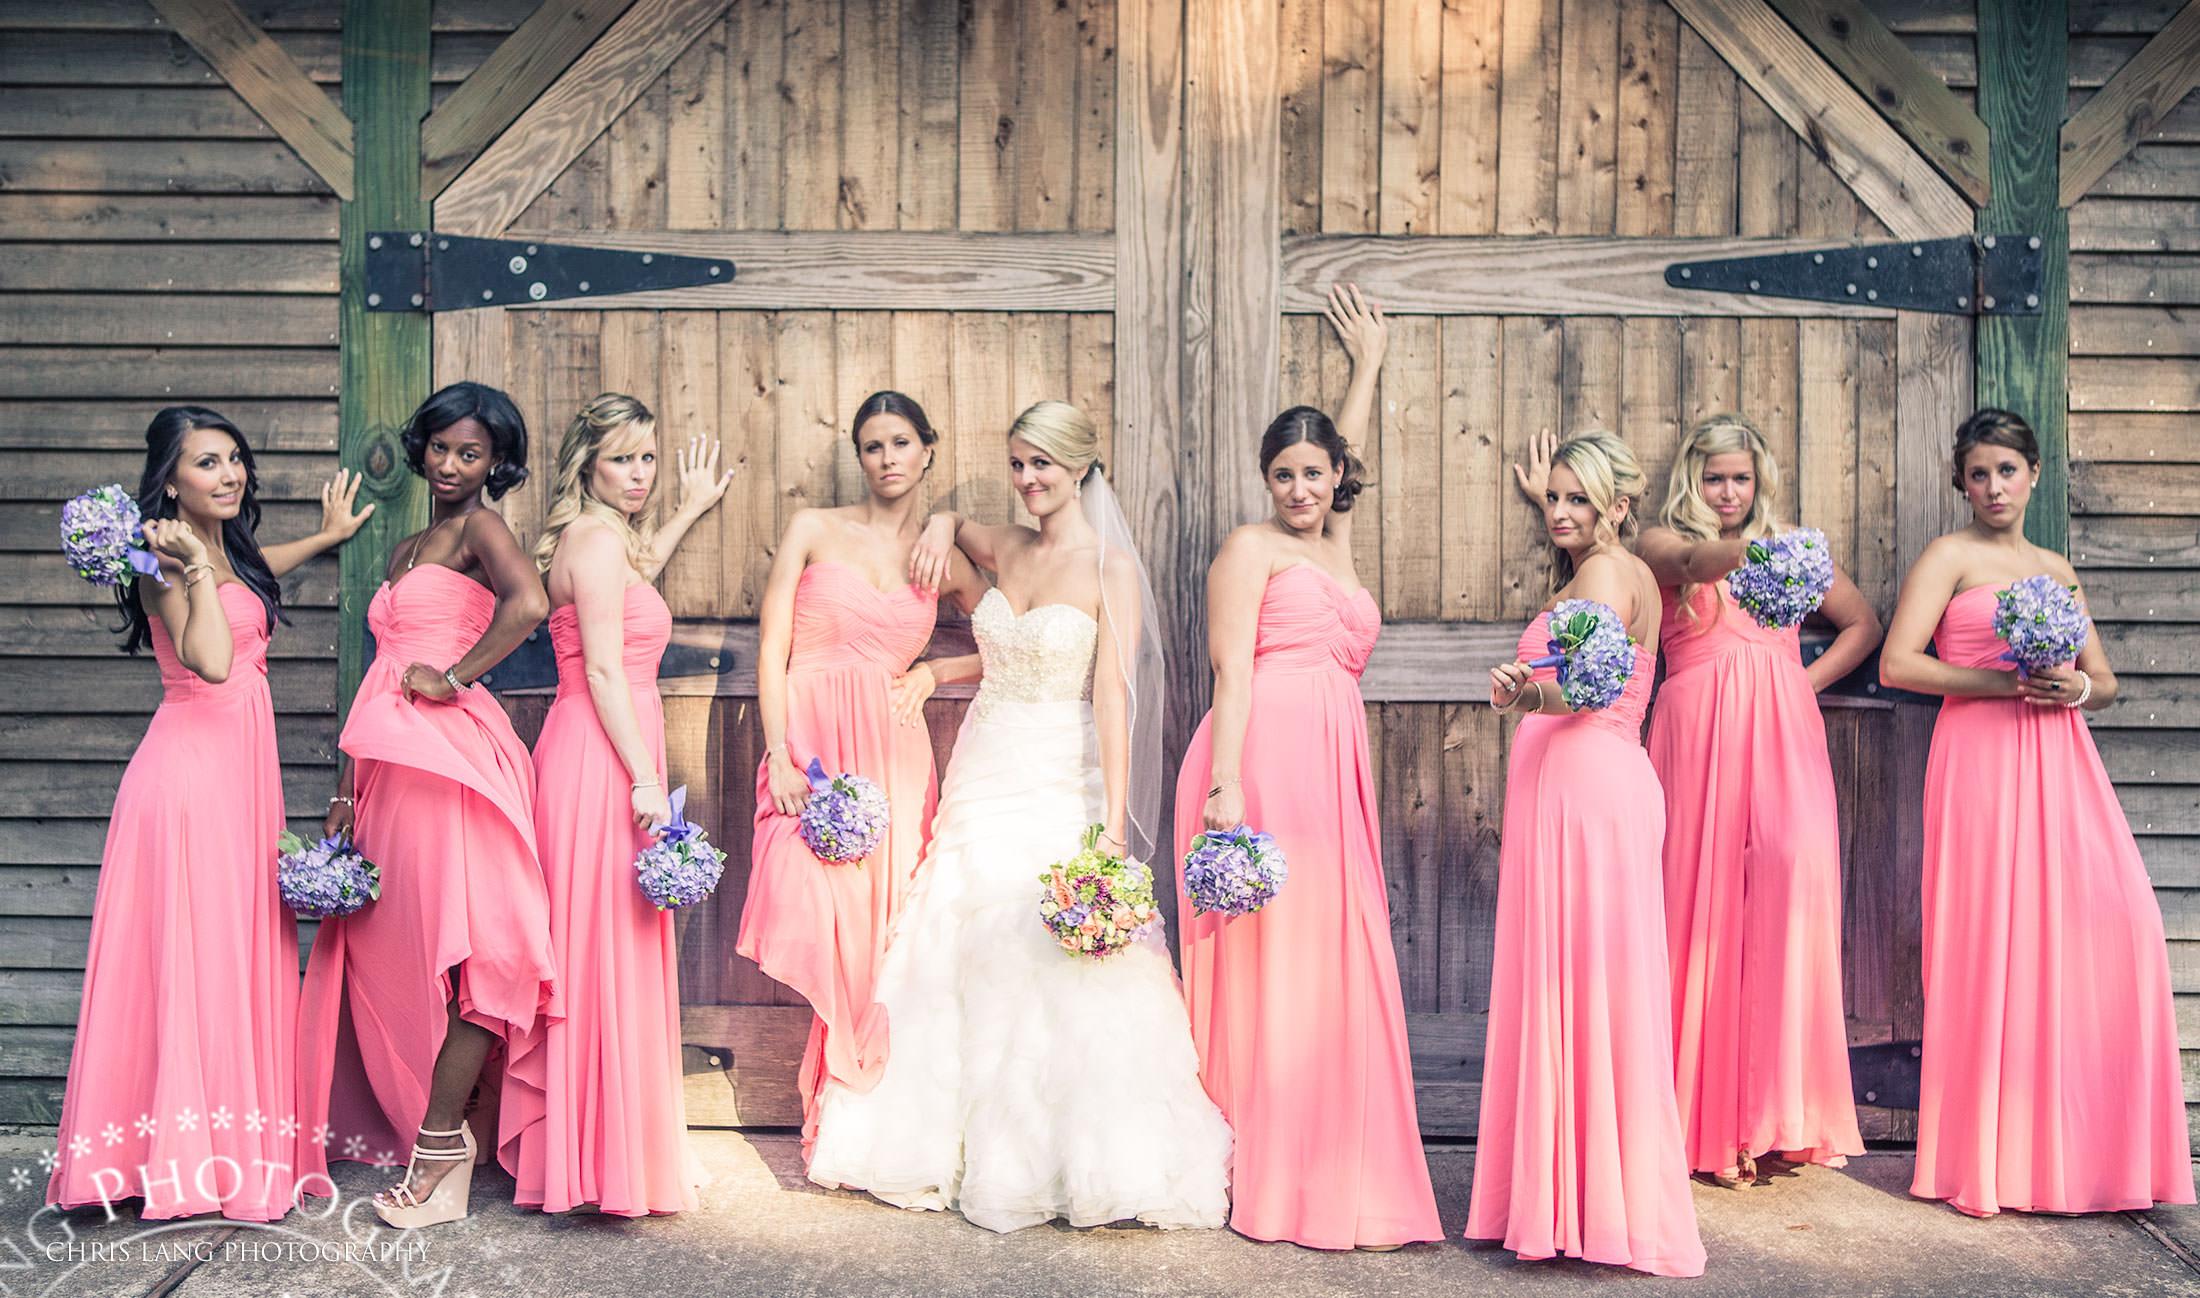 Bridesmaids Movie Pose Birdemaid Photos Wilmington Nc Wedding Photographers Bridal Party